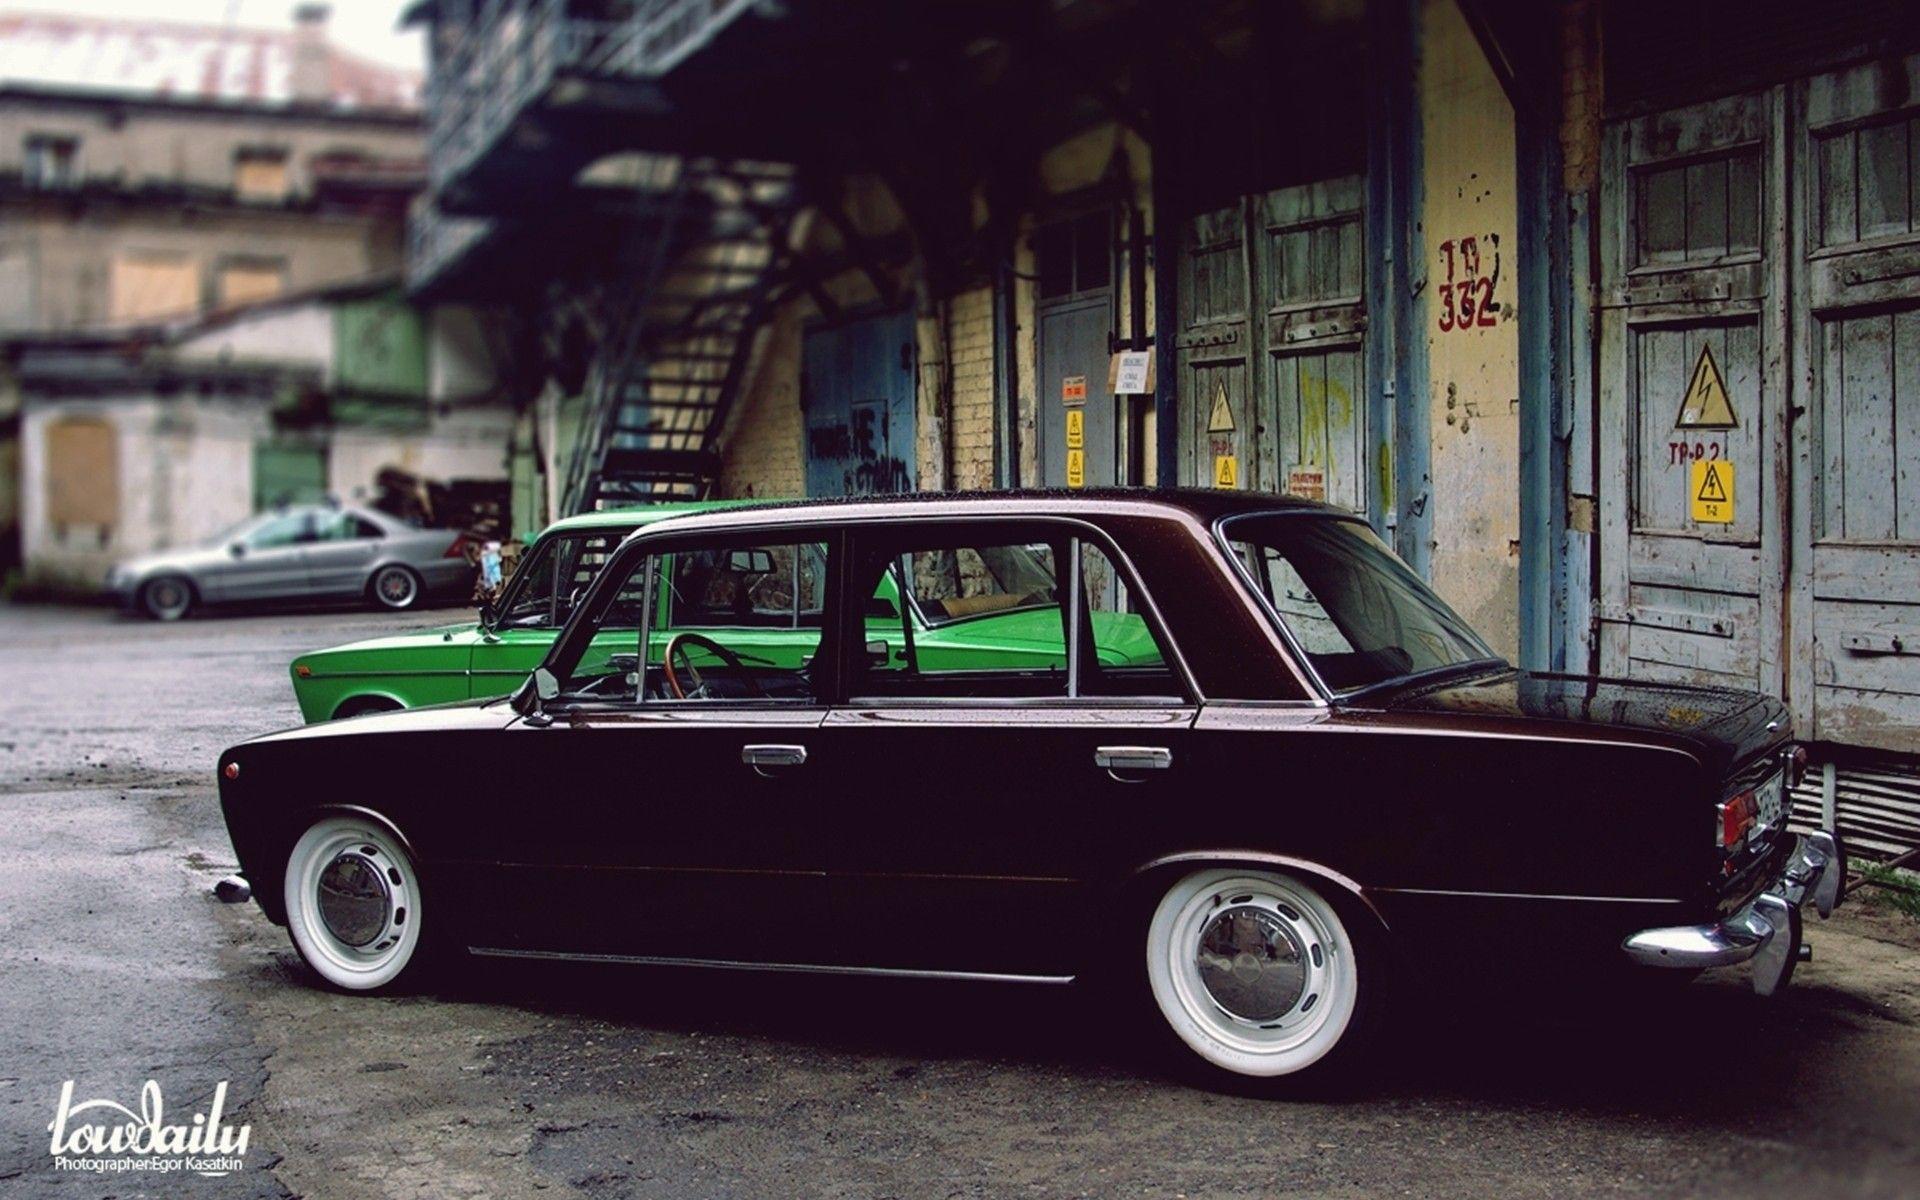 Pin By Joel Fermin On Wheels Old Cars Car Classic Cars